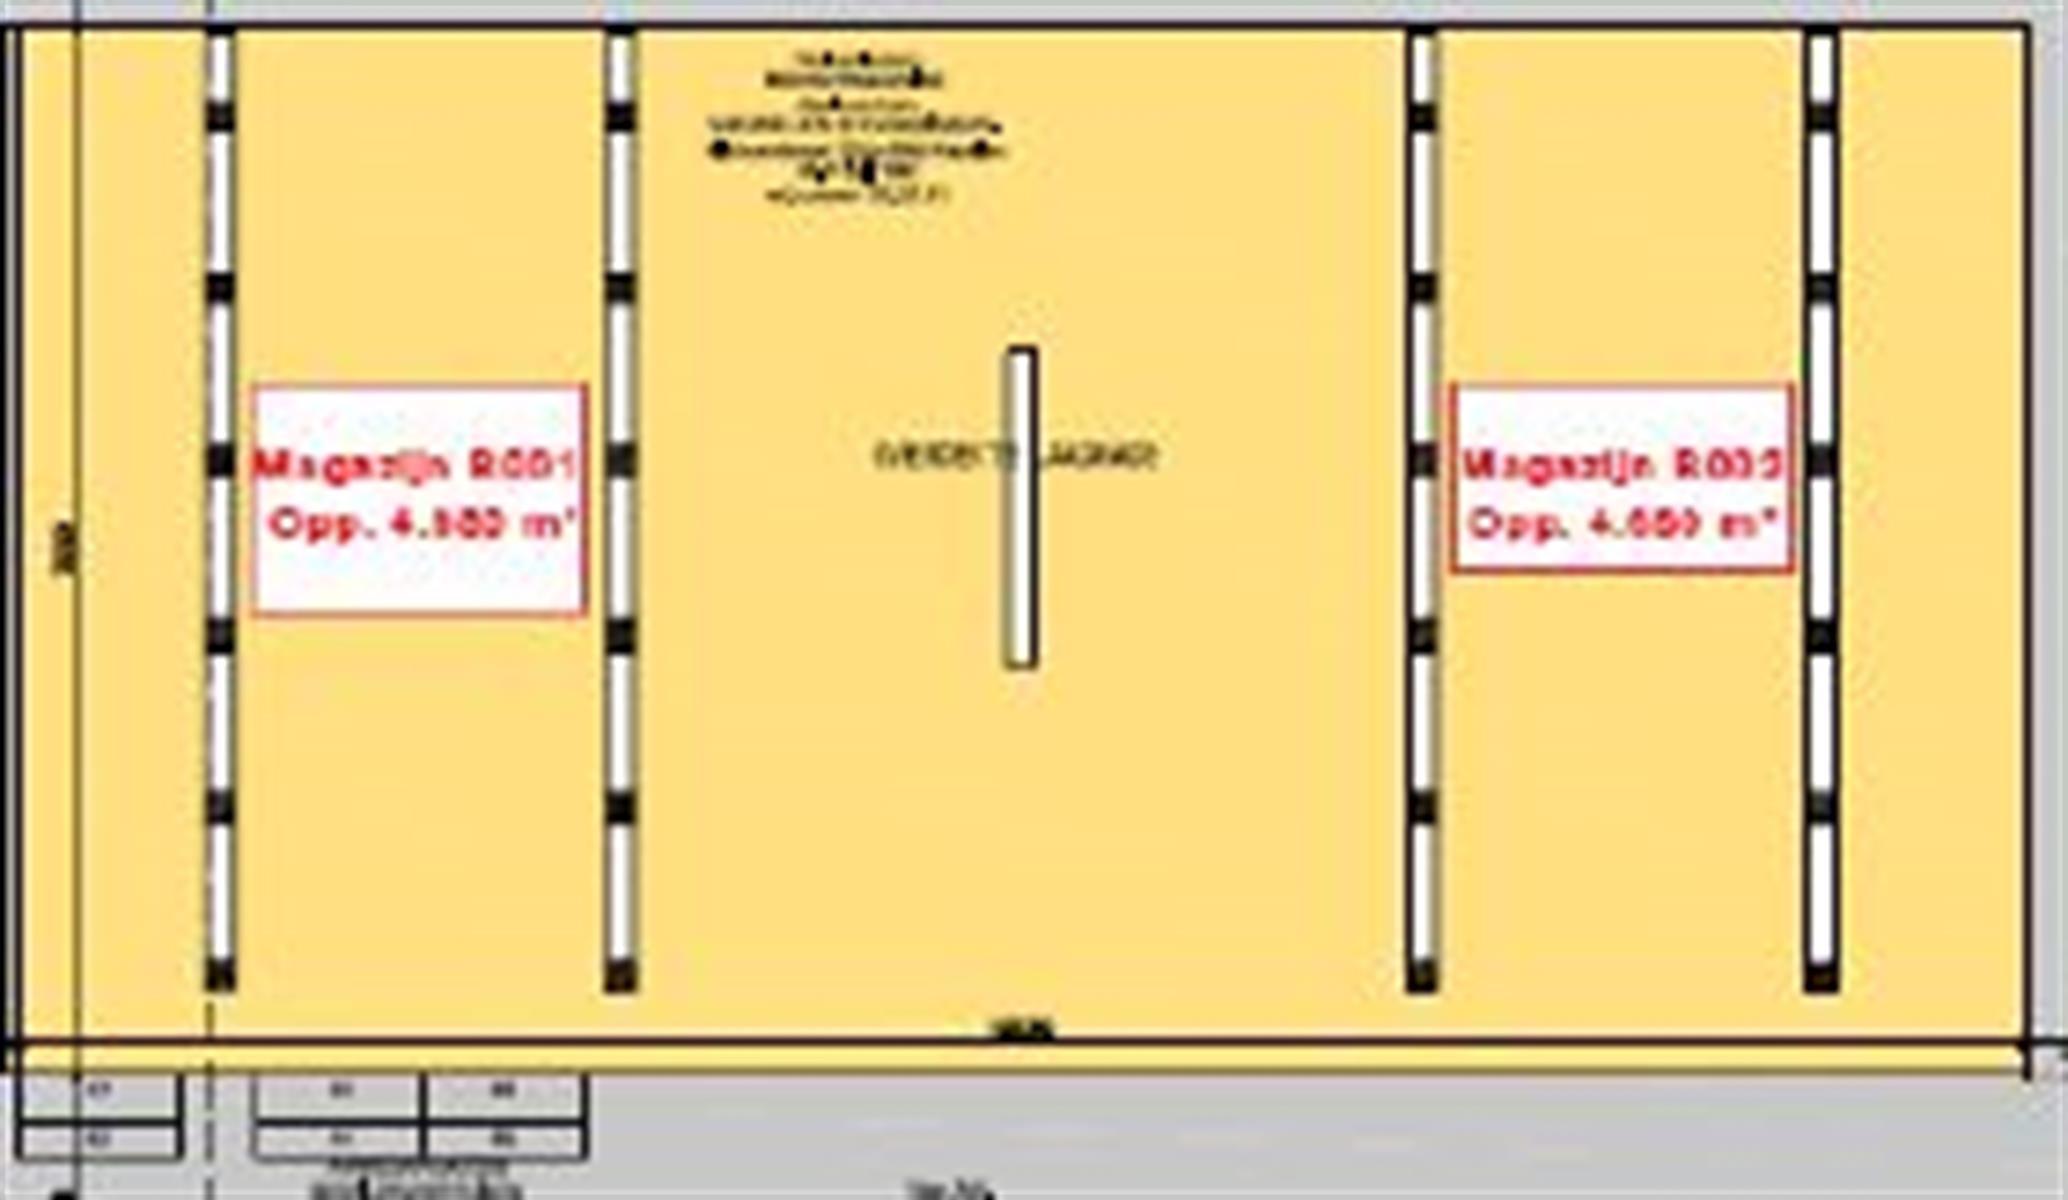 industrieel gebouw te huur KMO UNIT 1620m² MEERDERE LOADING DOCKS te KAPELLEN (B002) 1640m² - 2950 Kapellen, België 2